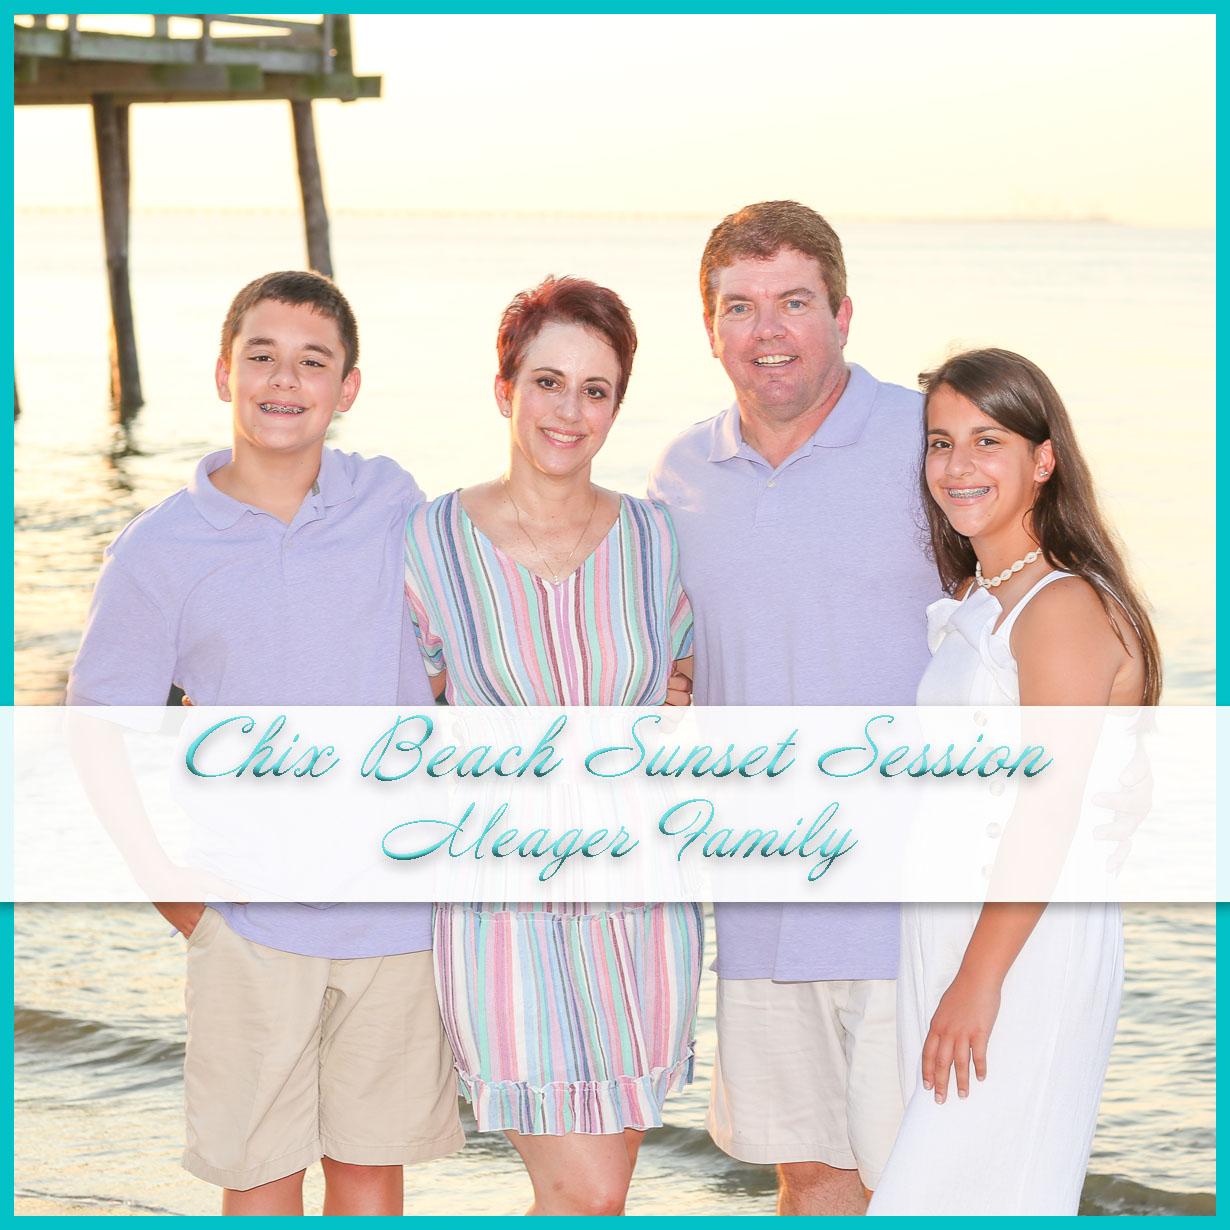 Chix Beach Sunset Session